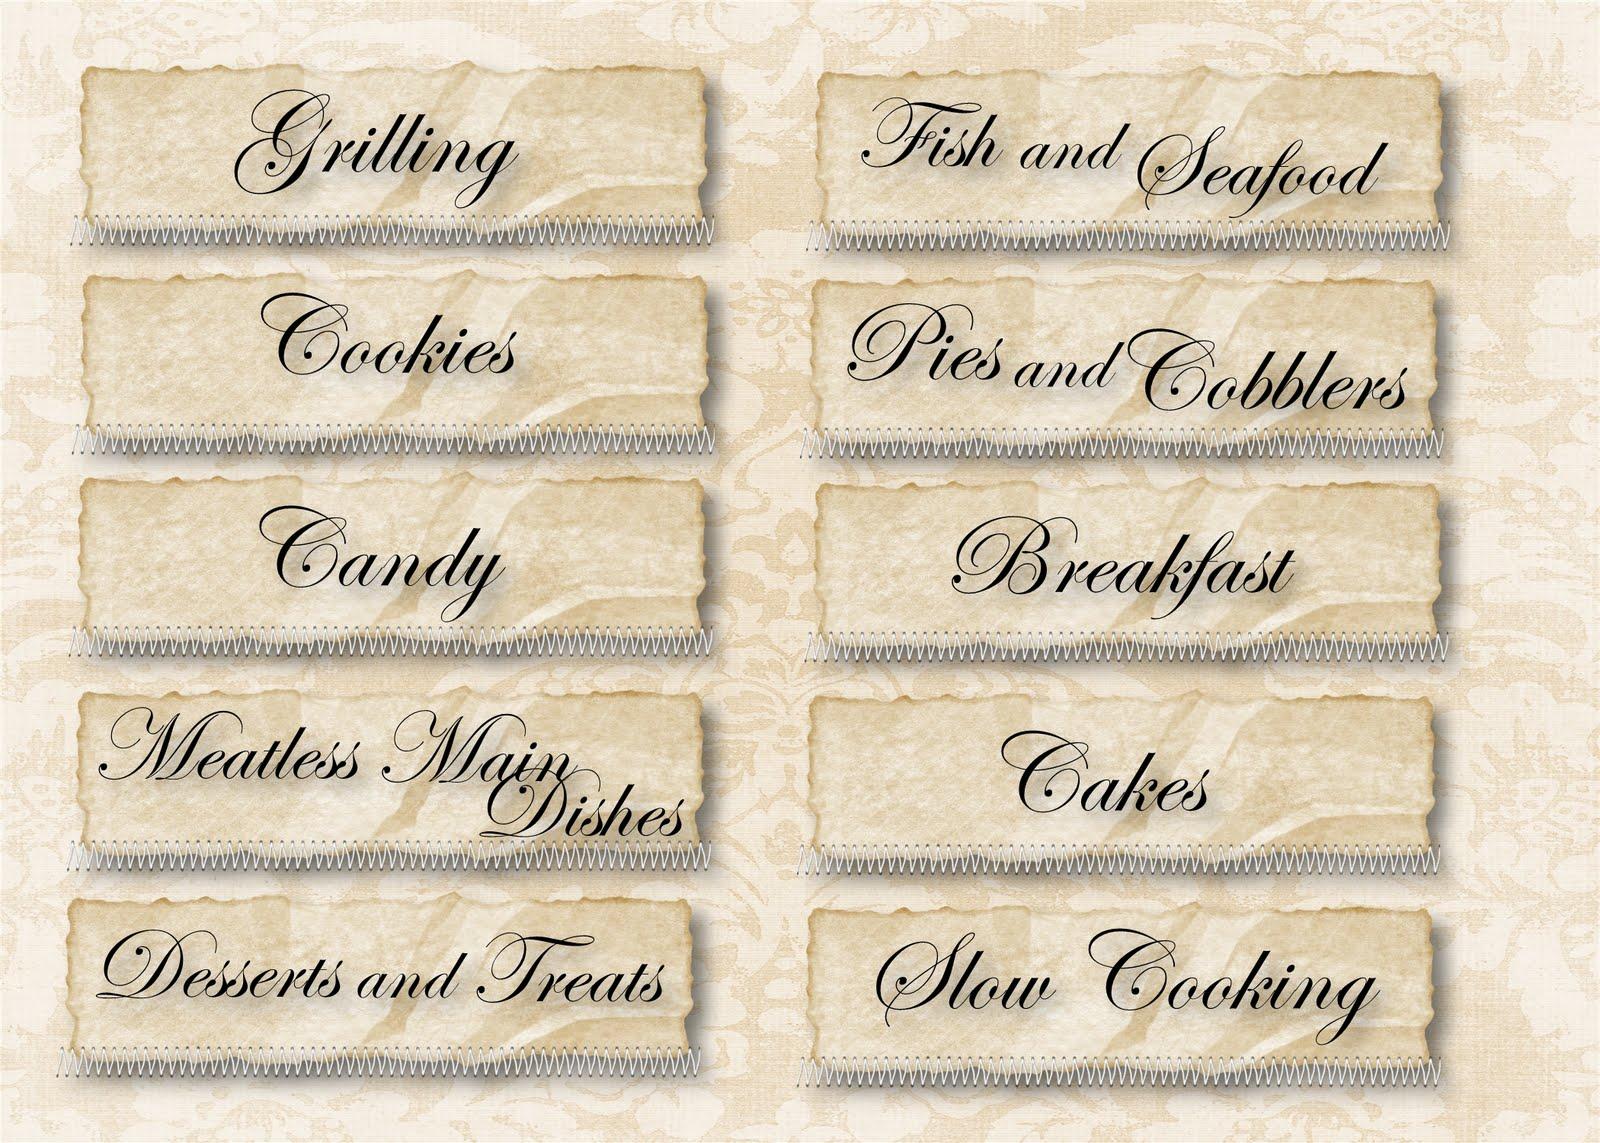 Recipes Boxes Cards Recipe Card Dividers Tab Box